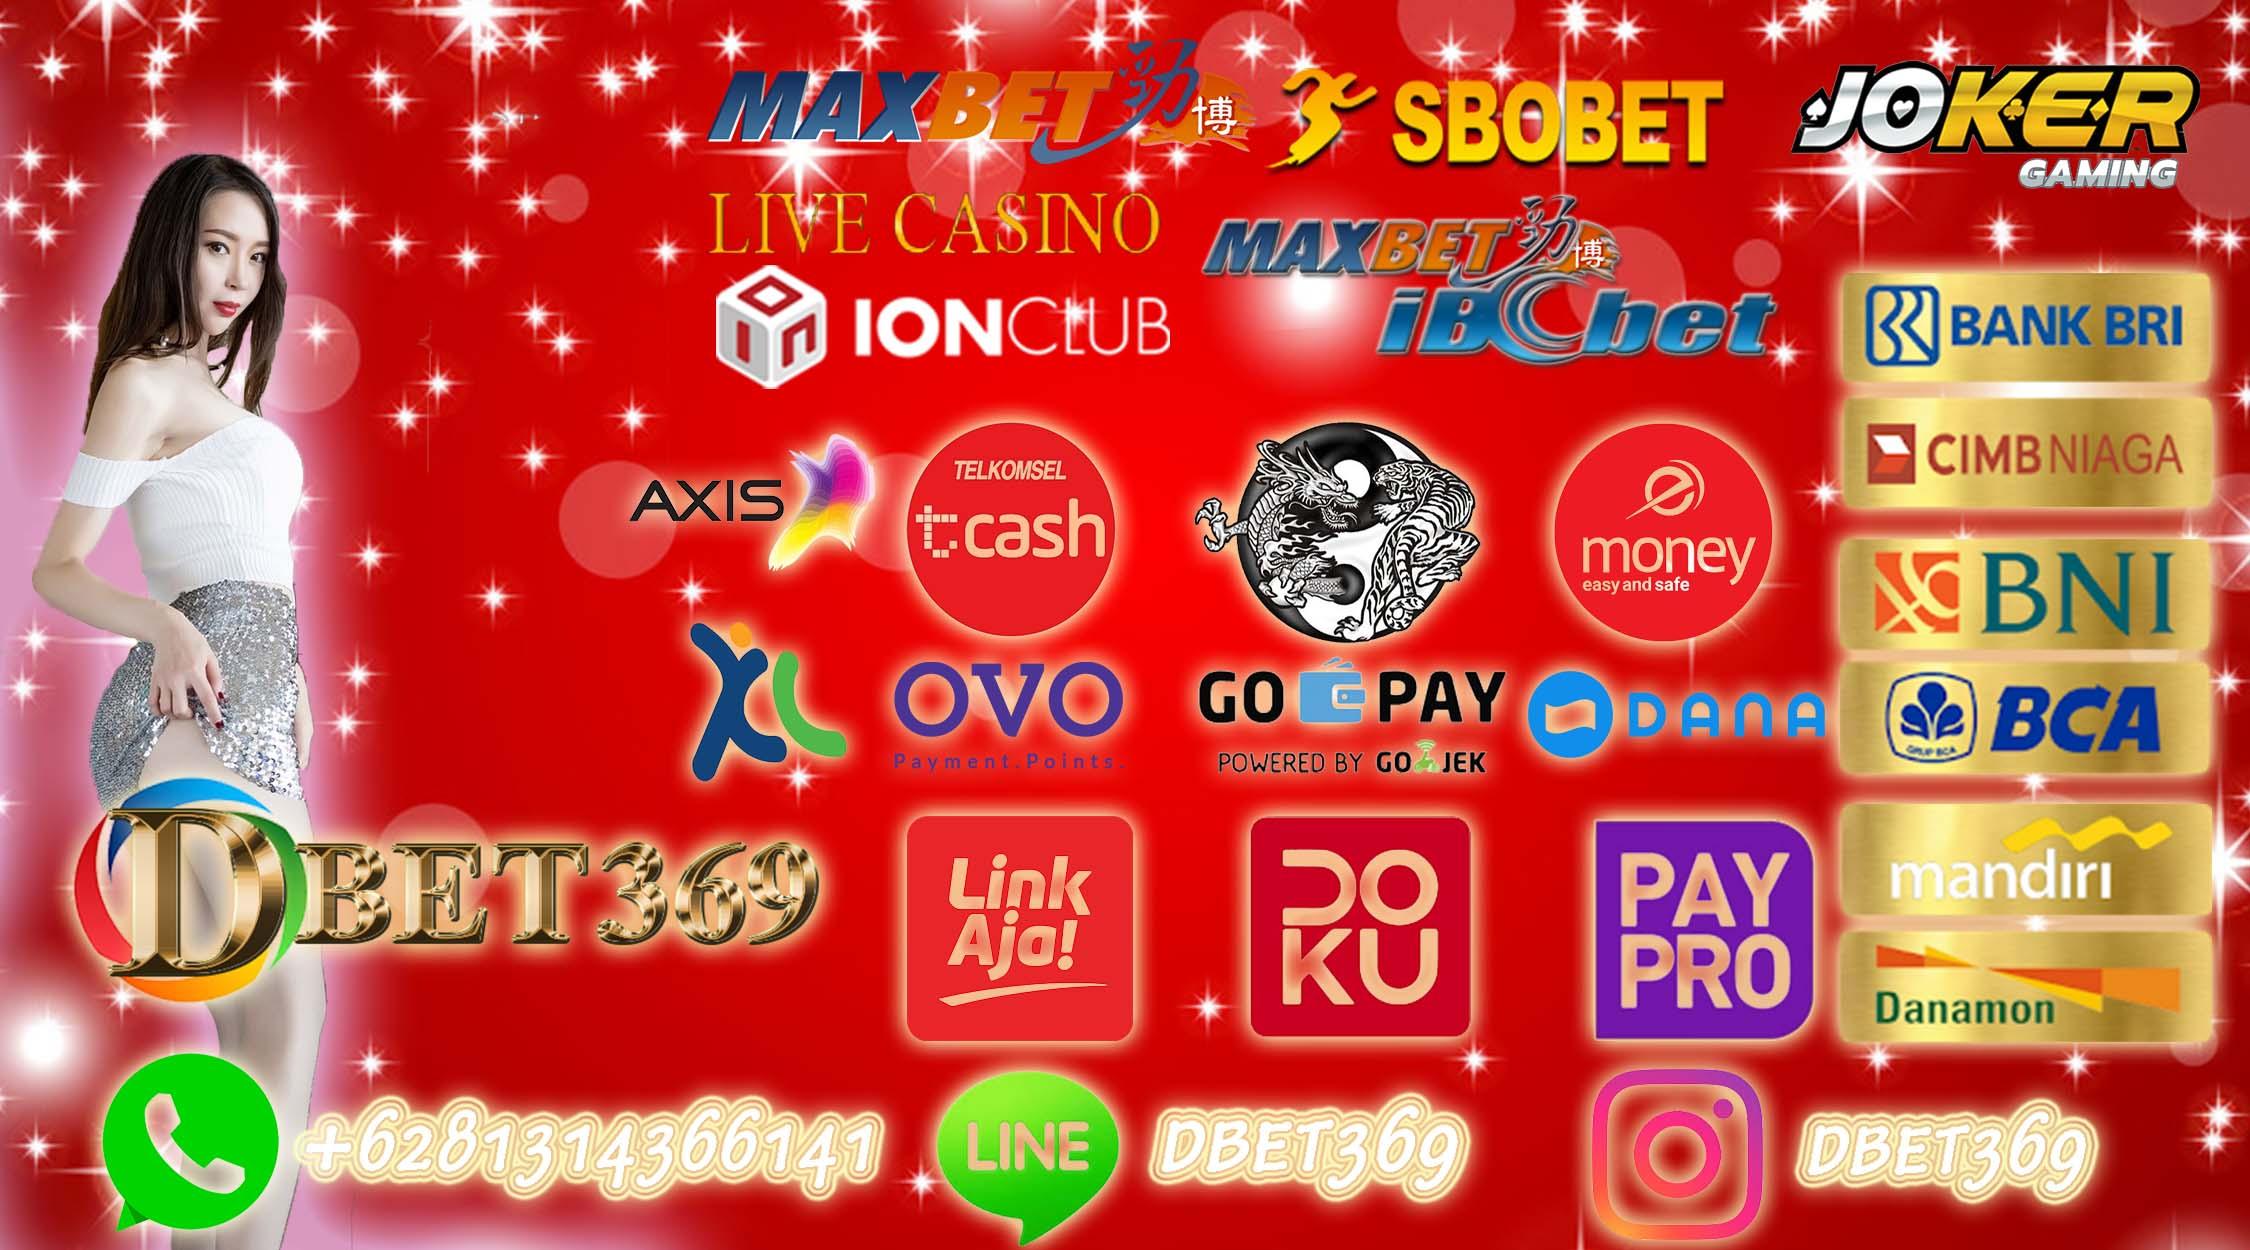 agen resmi ion casino Tepercaya Di Indonesia